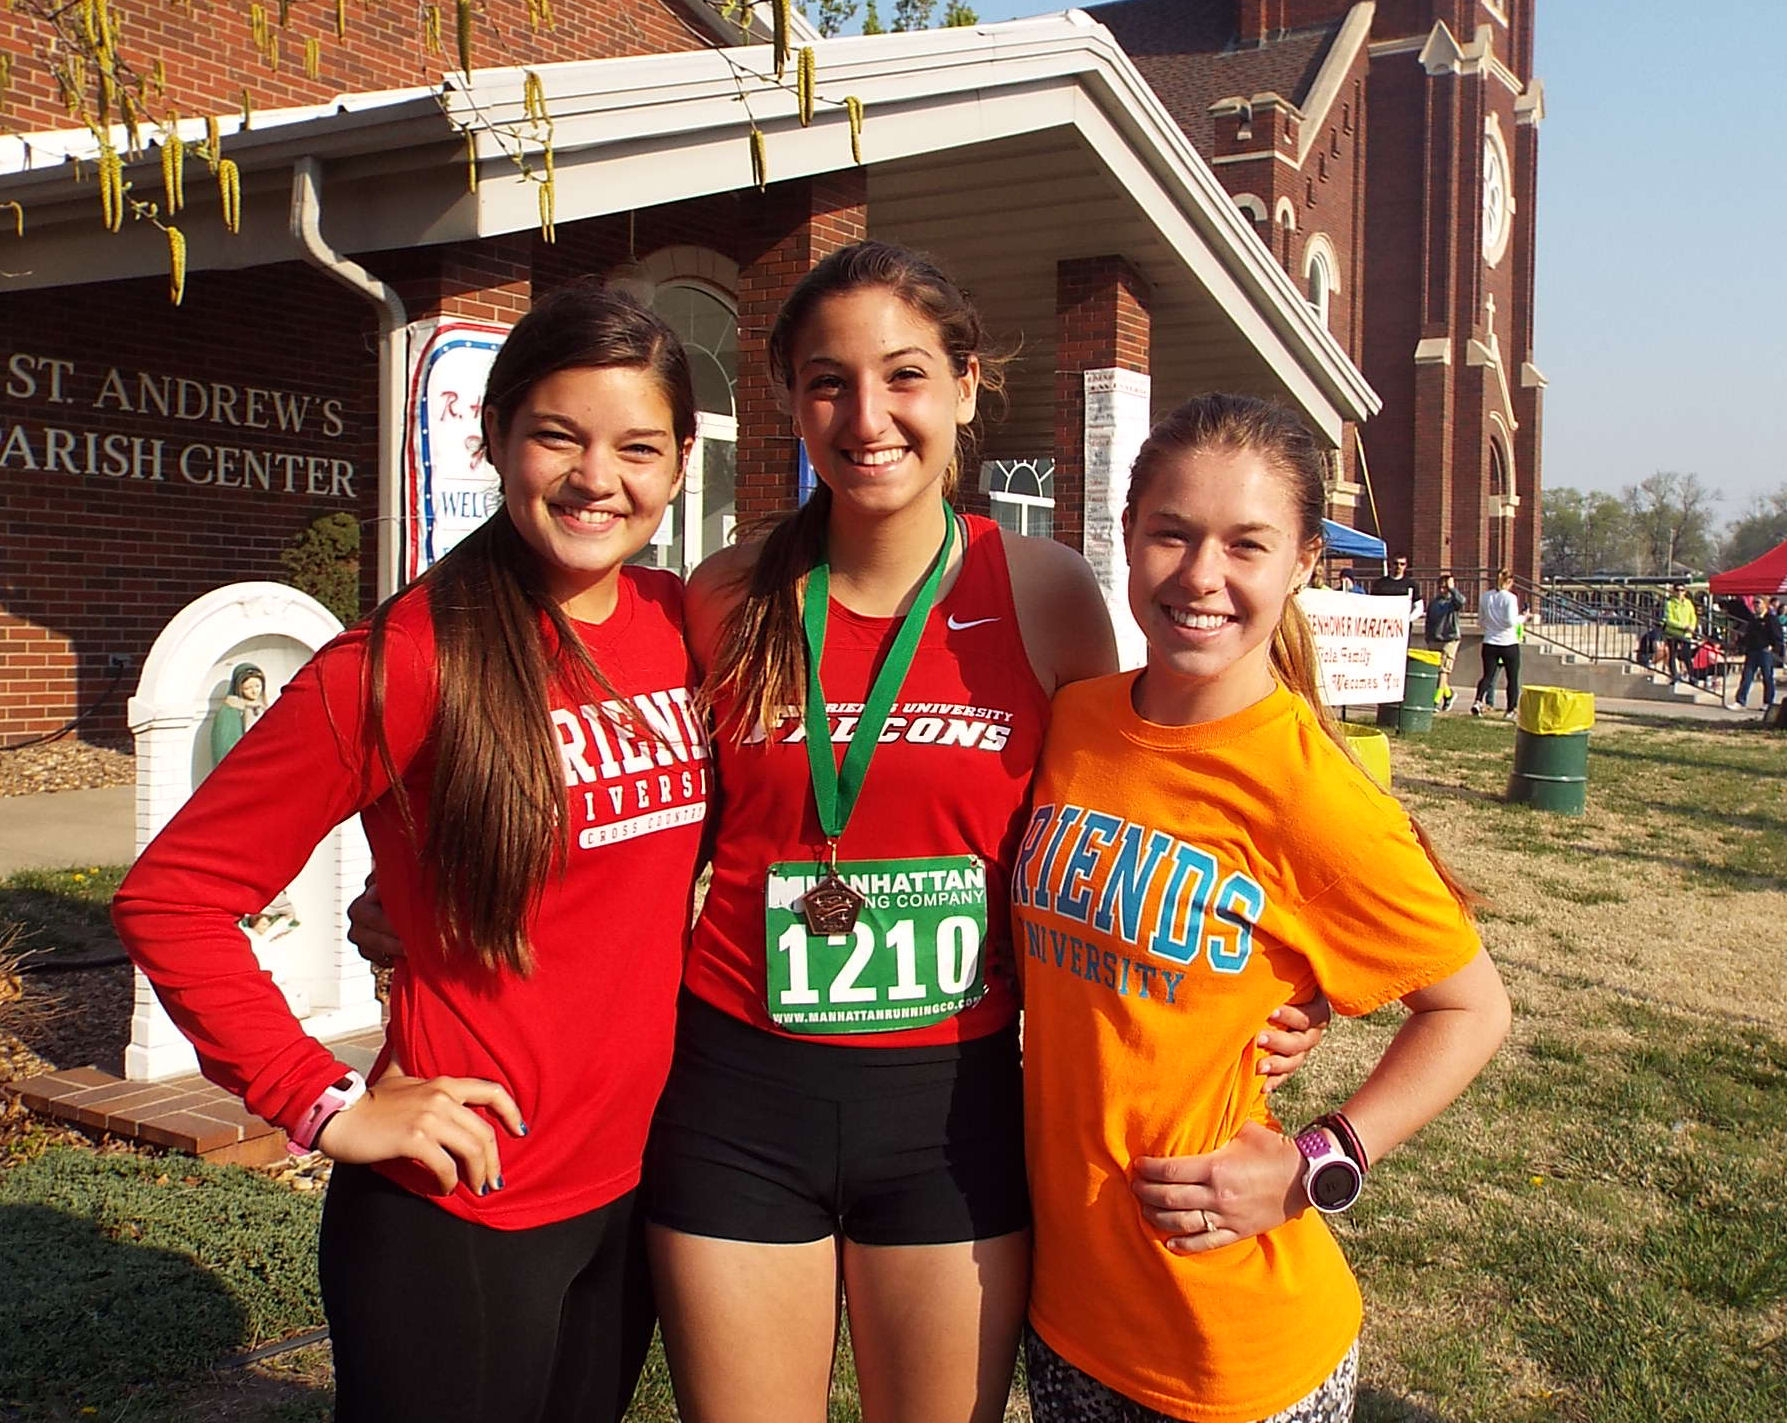 Women's half-marathon winner Sydney Roy's teammates supported her along the way.